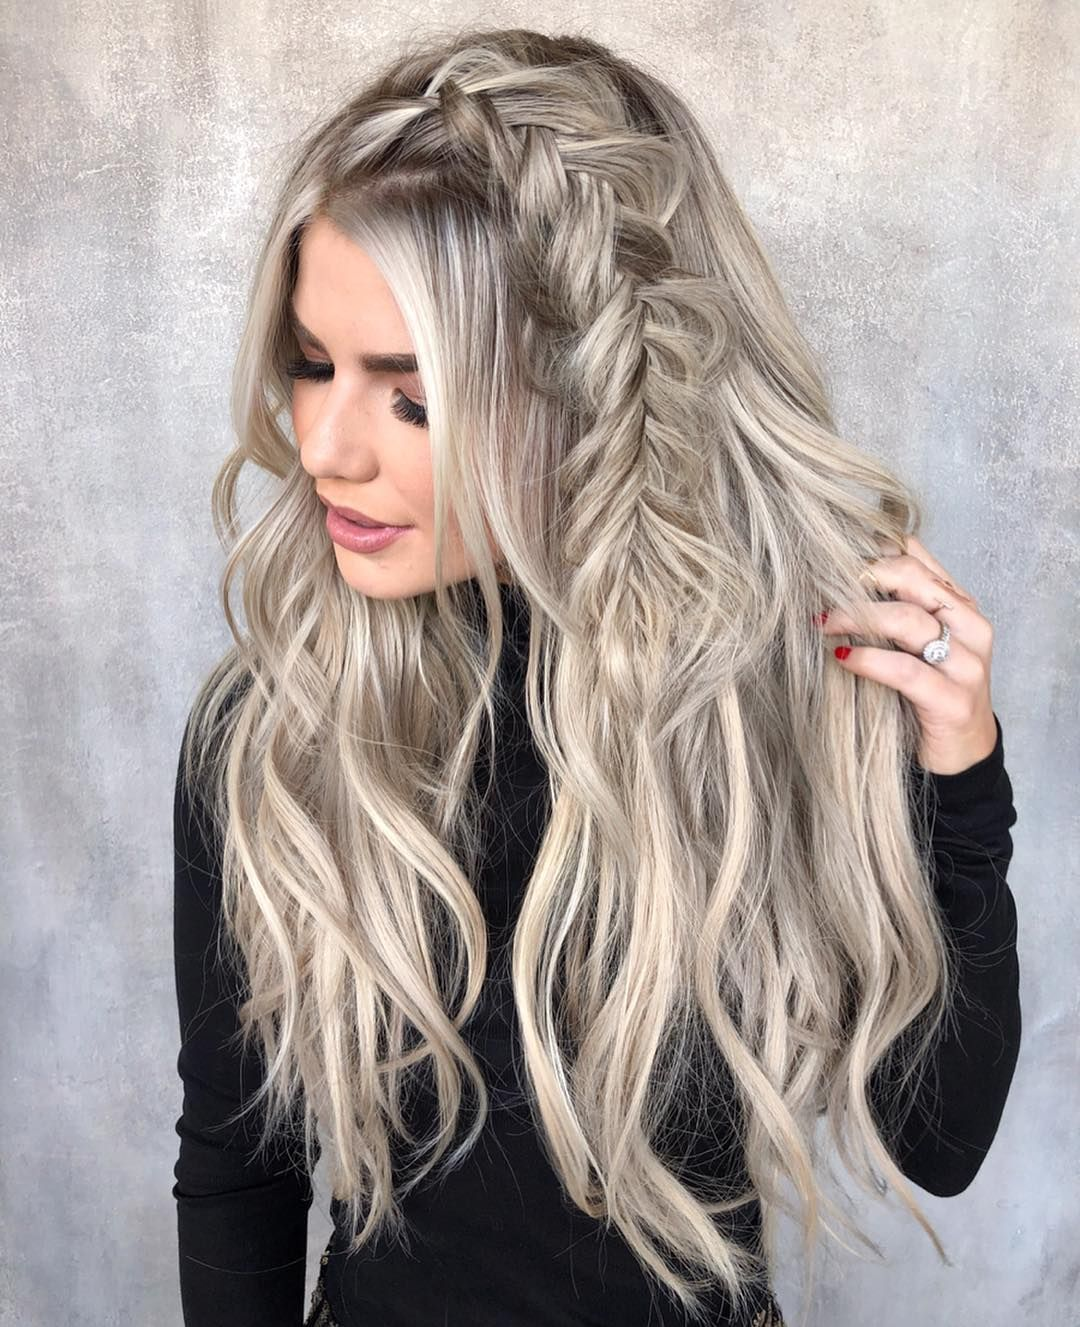 Pin by jodie dusseault on hair inspire pinterest lambs